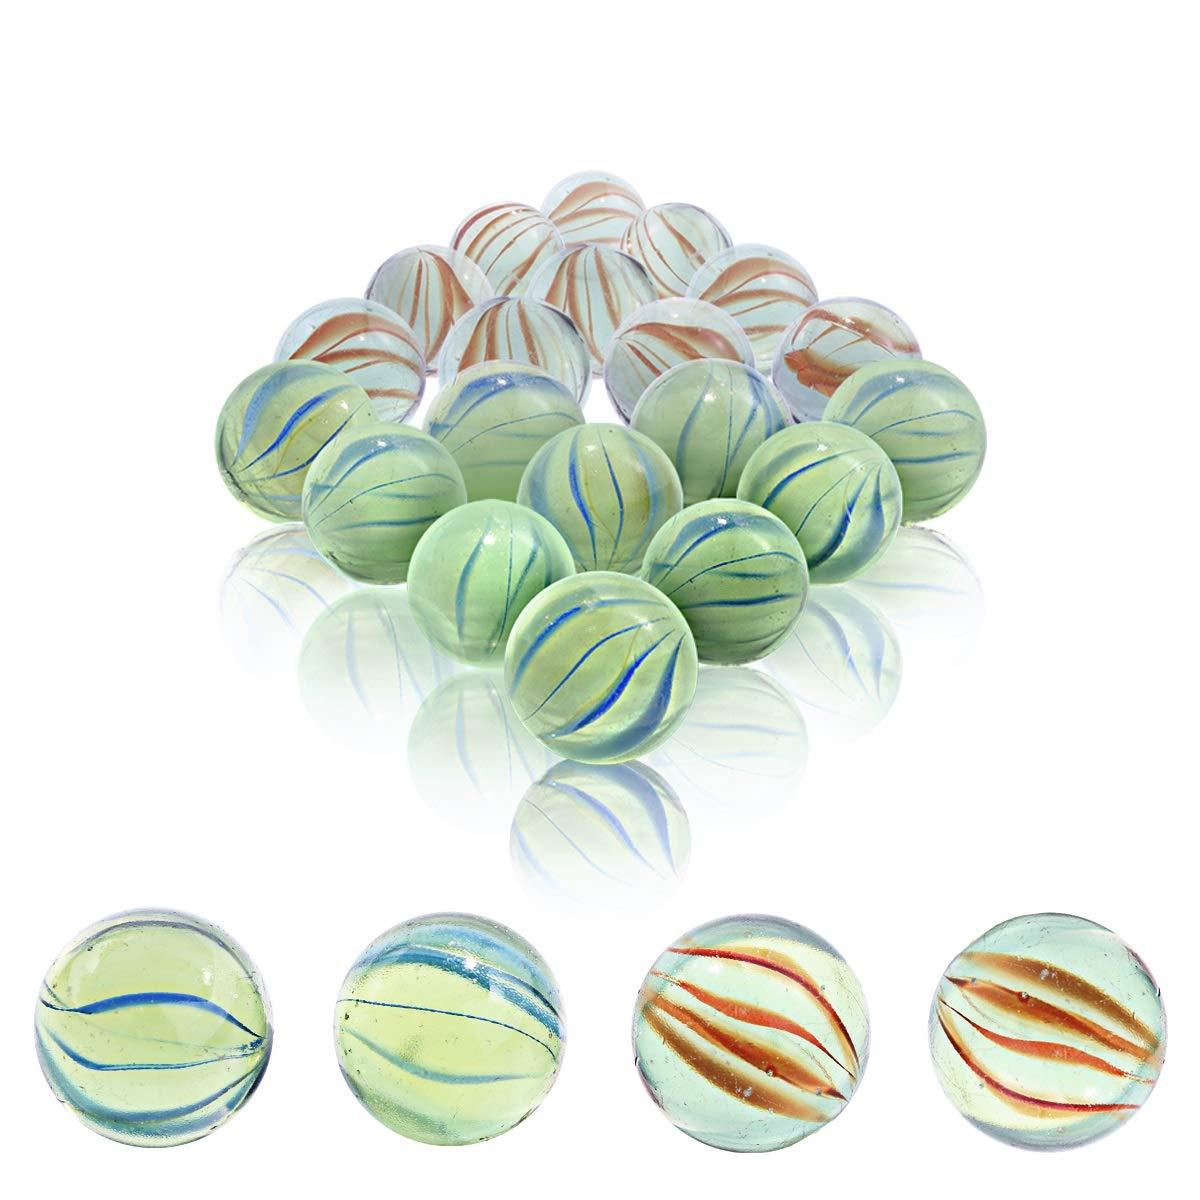 IFfree 1 Mega Marbles in bulk Glass Marbles for Children SET OF 24 ASSORTED BULK